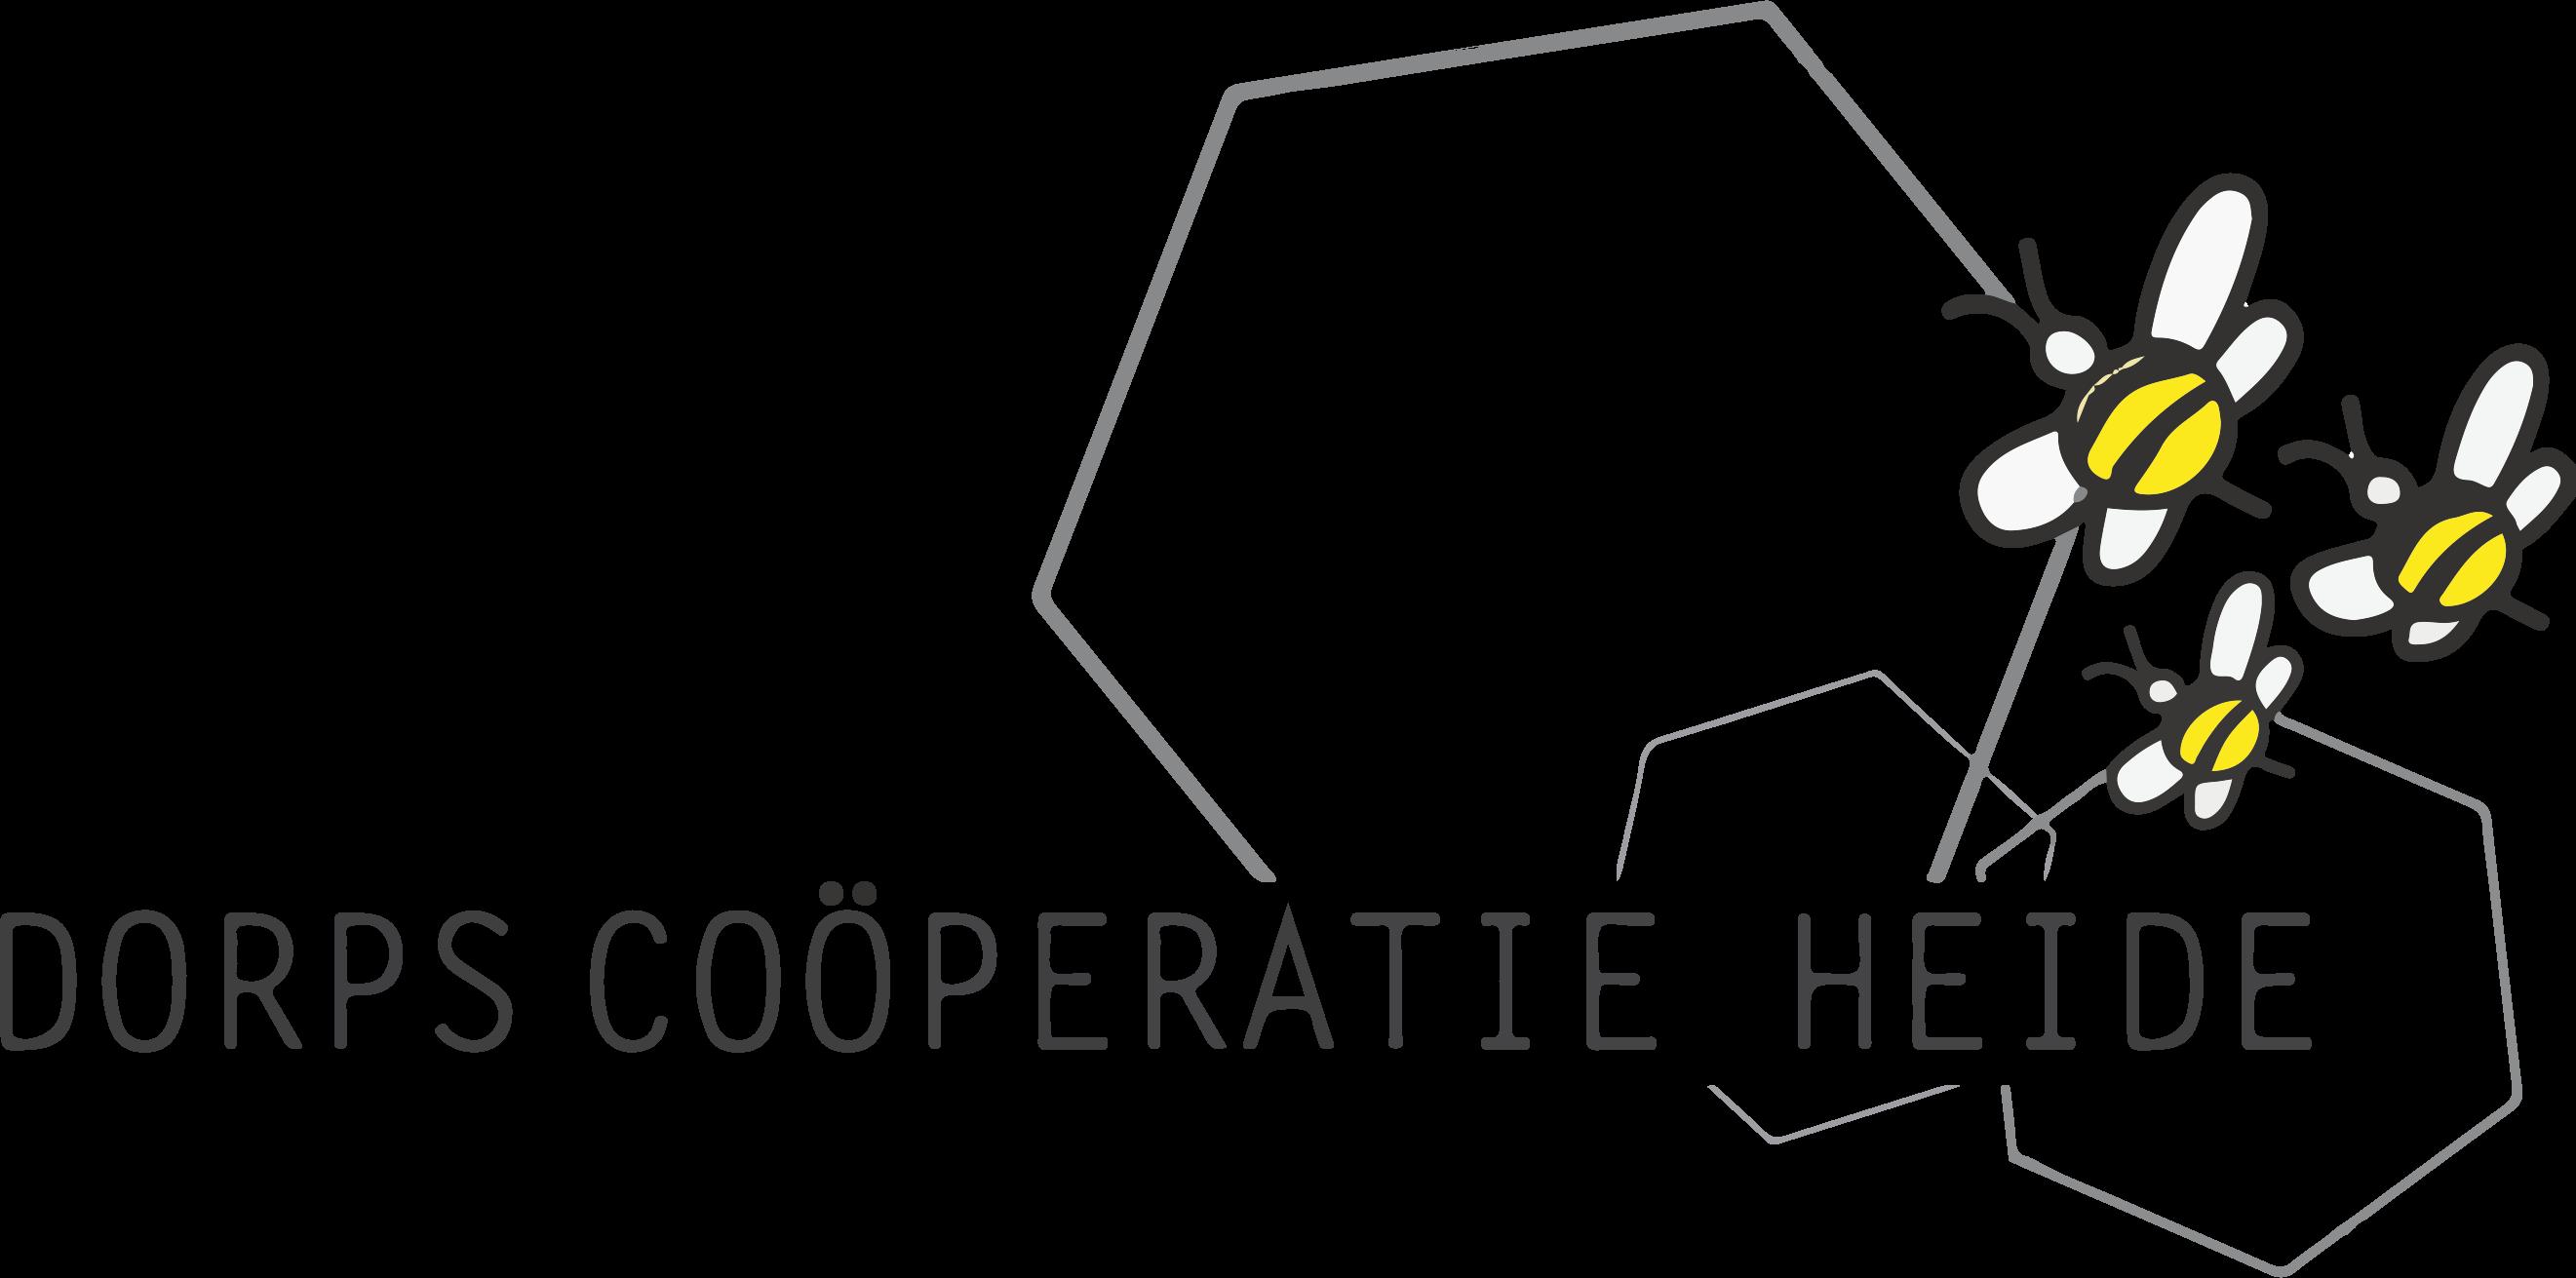 Dorpscoöperatie Heide